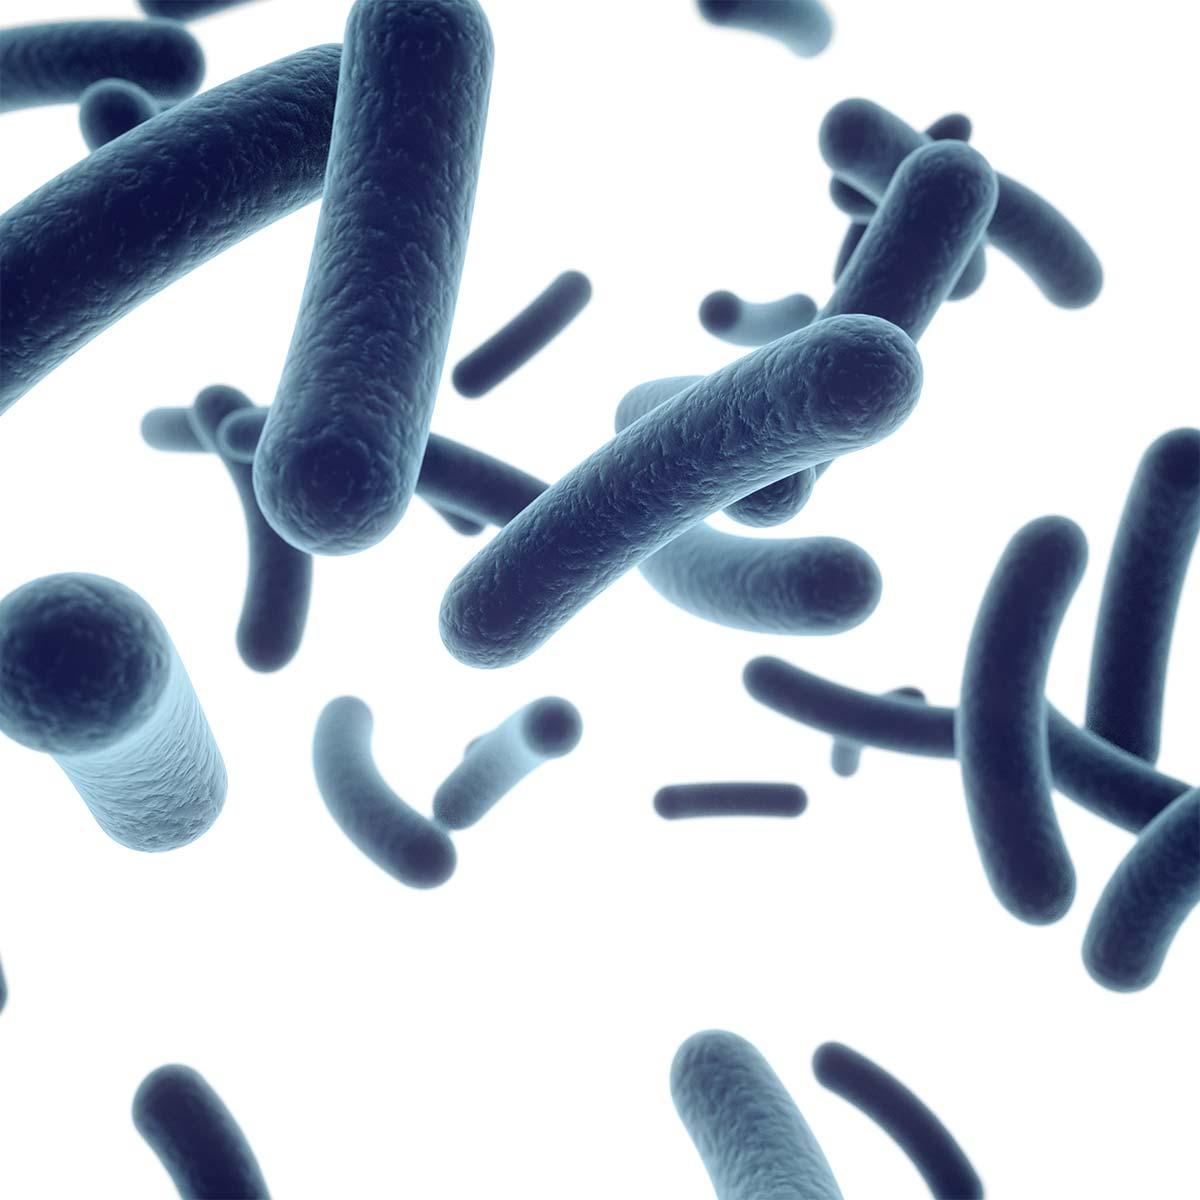 Skin Microecology Profile